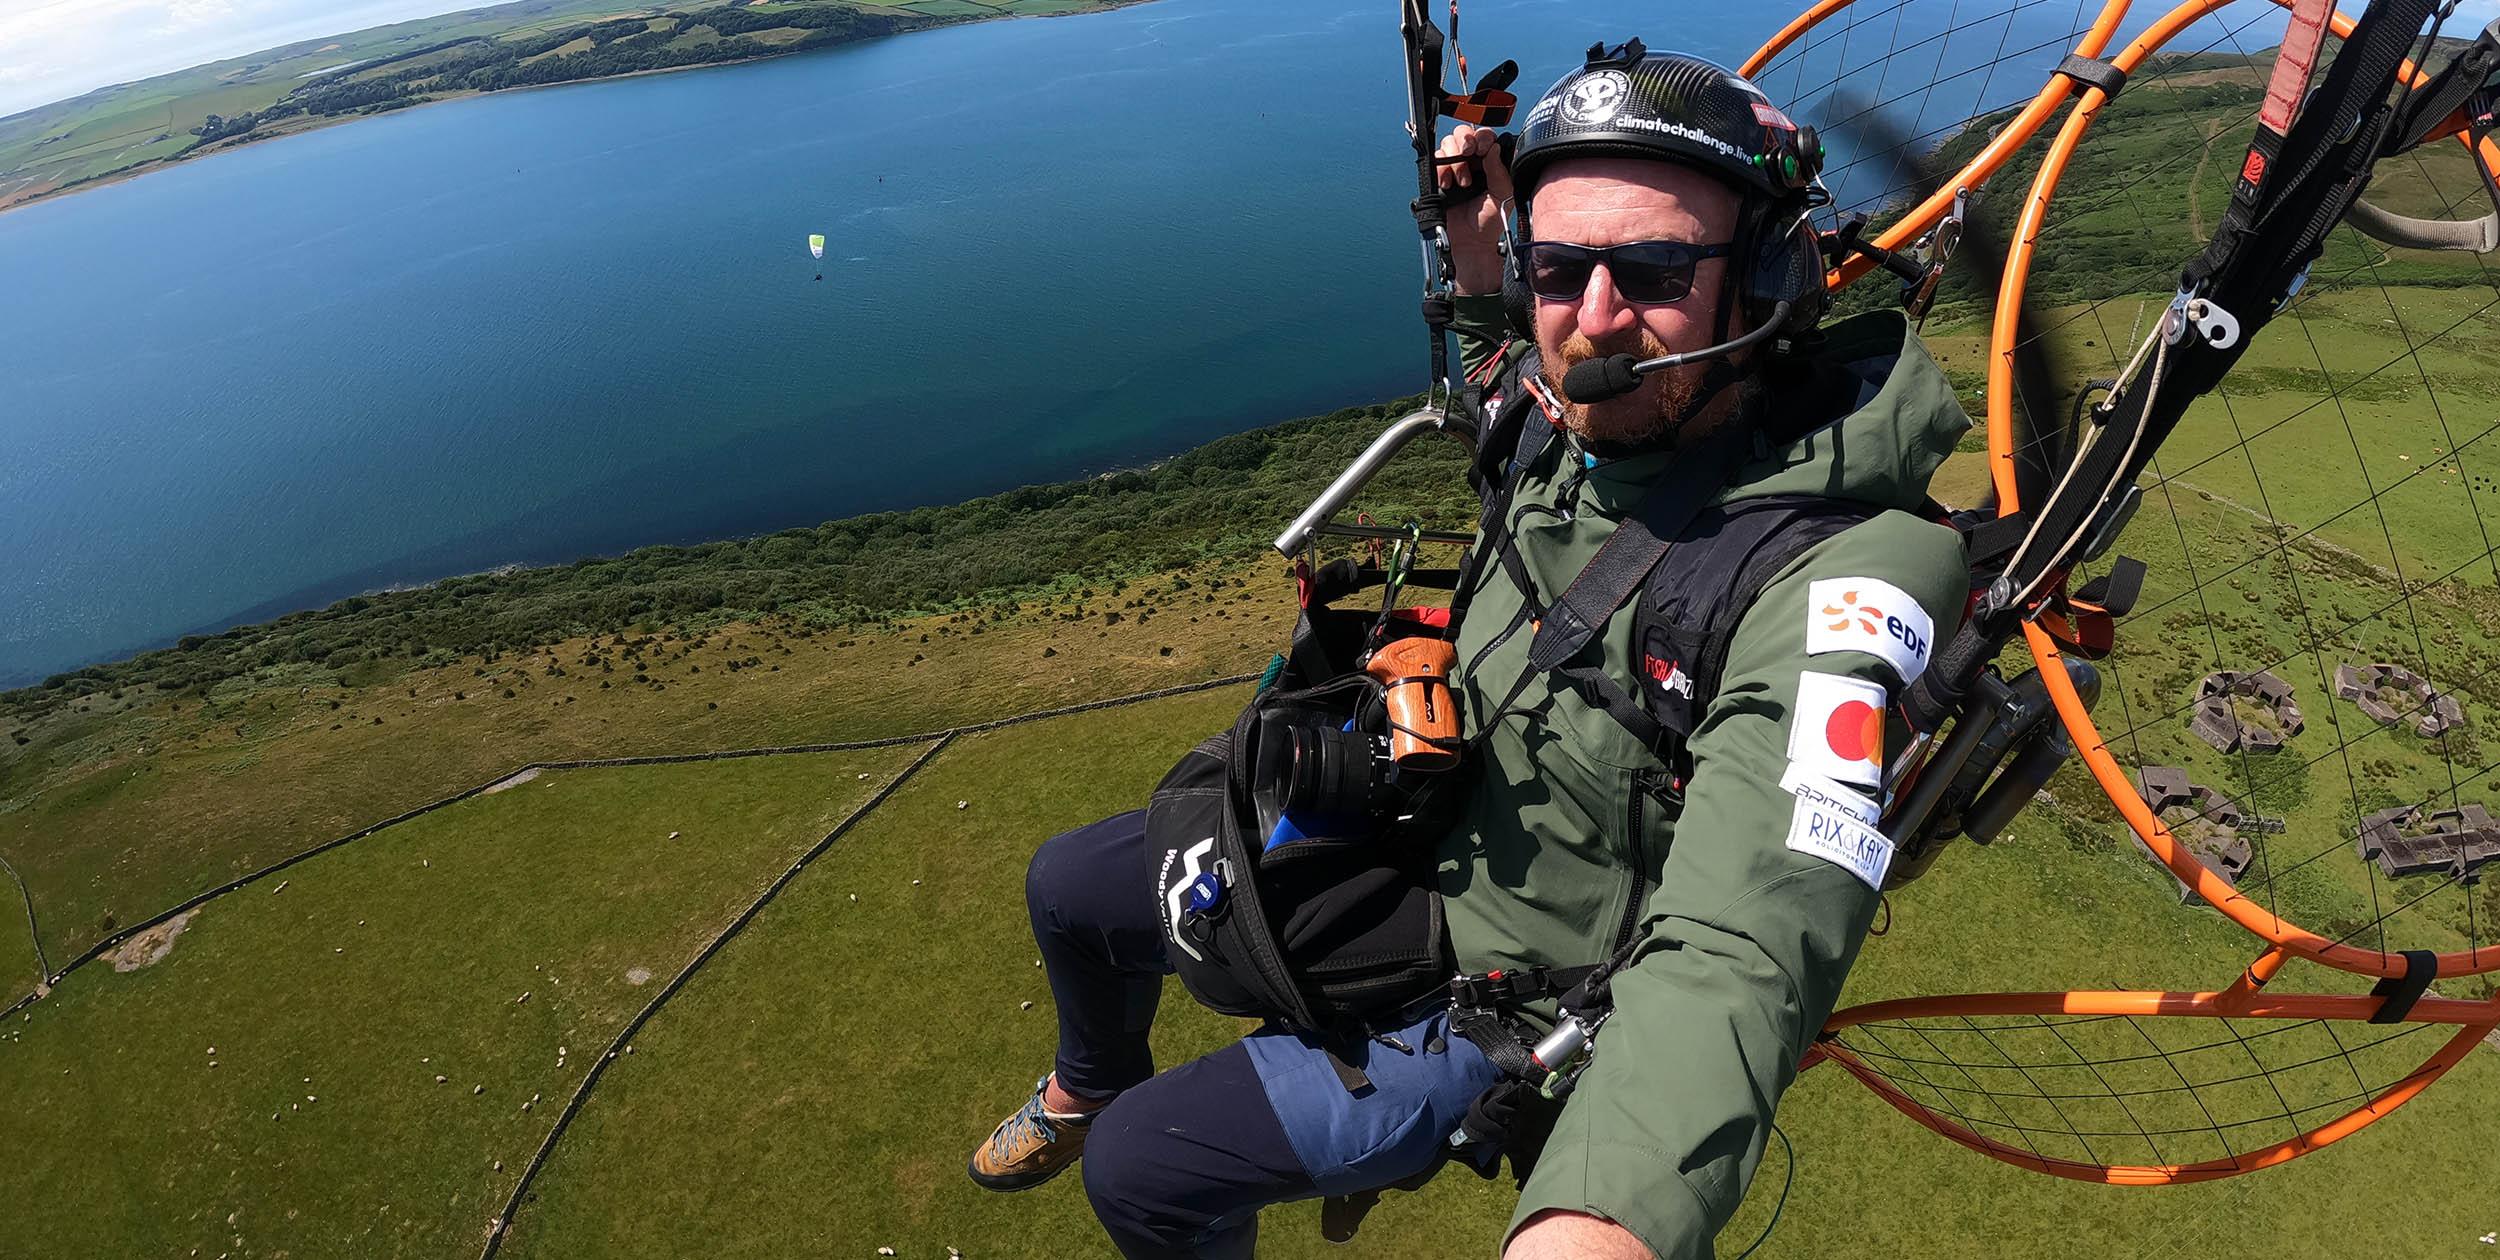 Dan Burton filming during the Round Britain Climate Challenge in July. Photo: Dan Burton